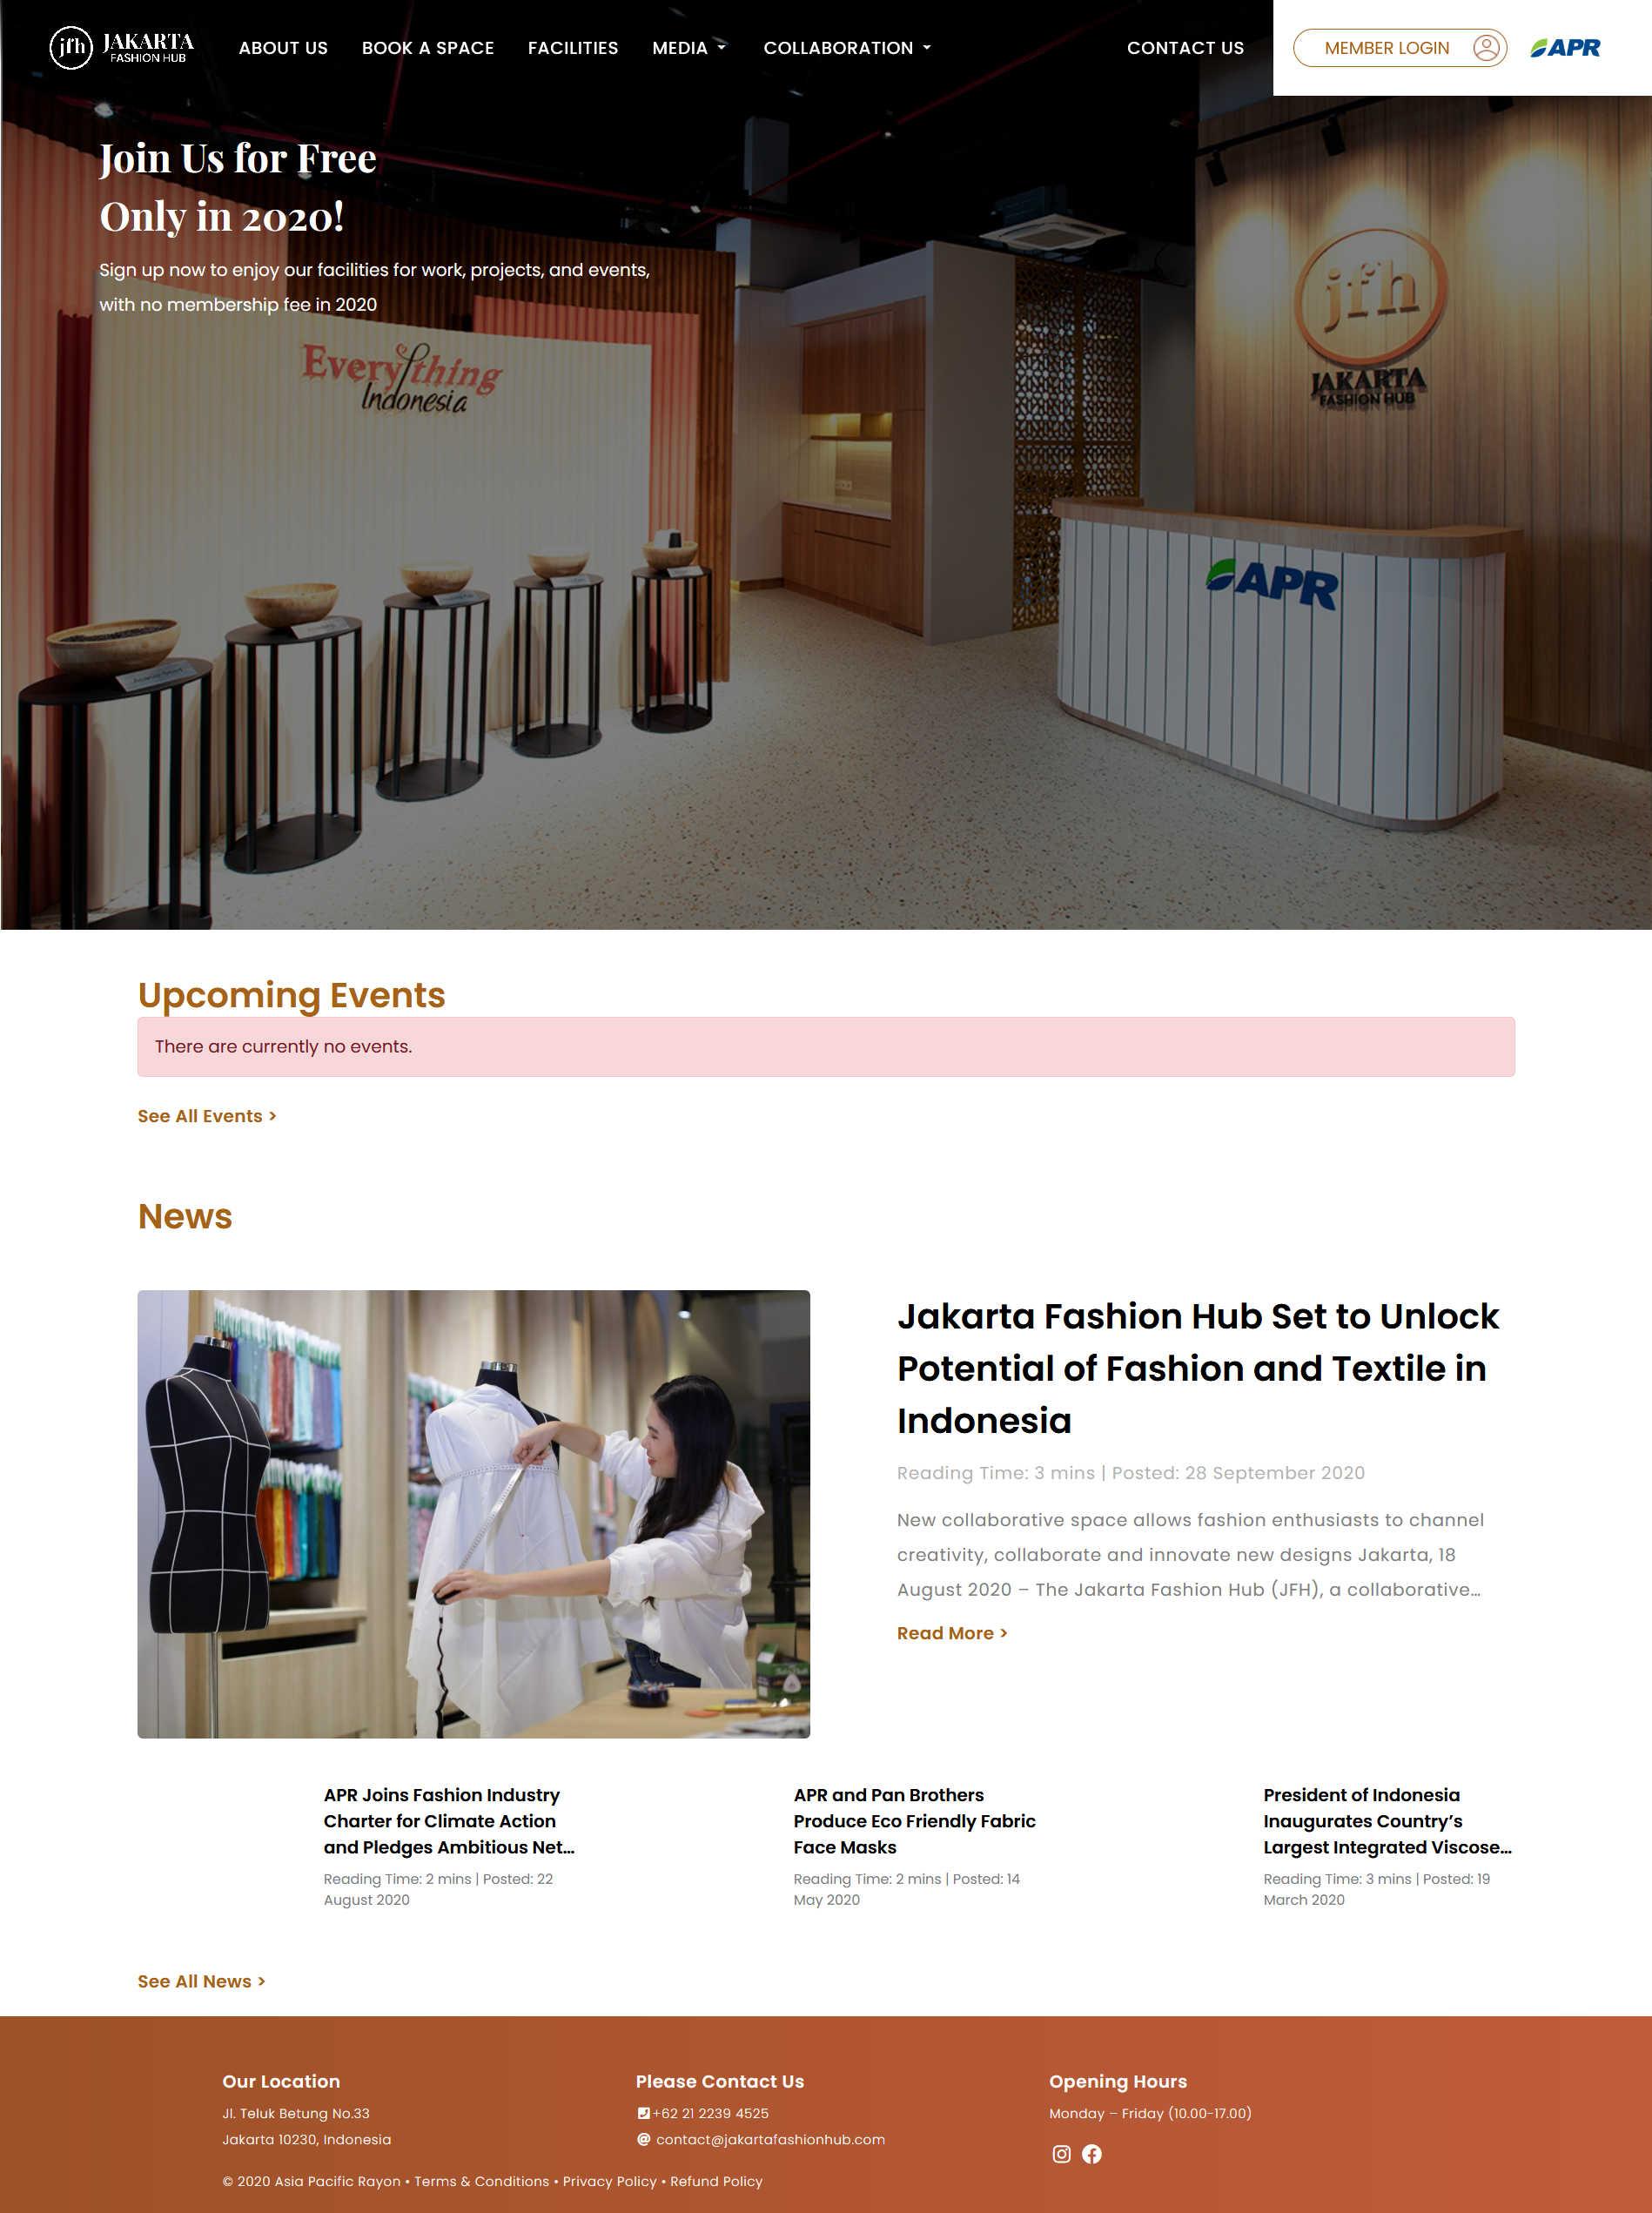 Jakarta Fashion Hub